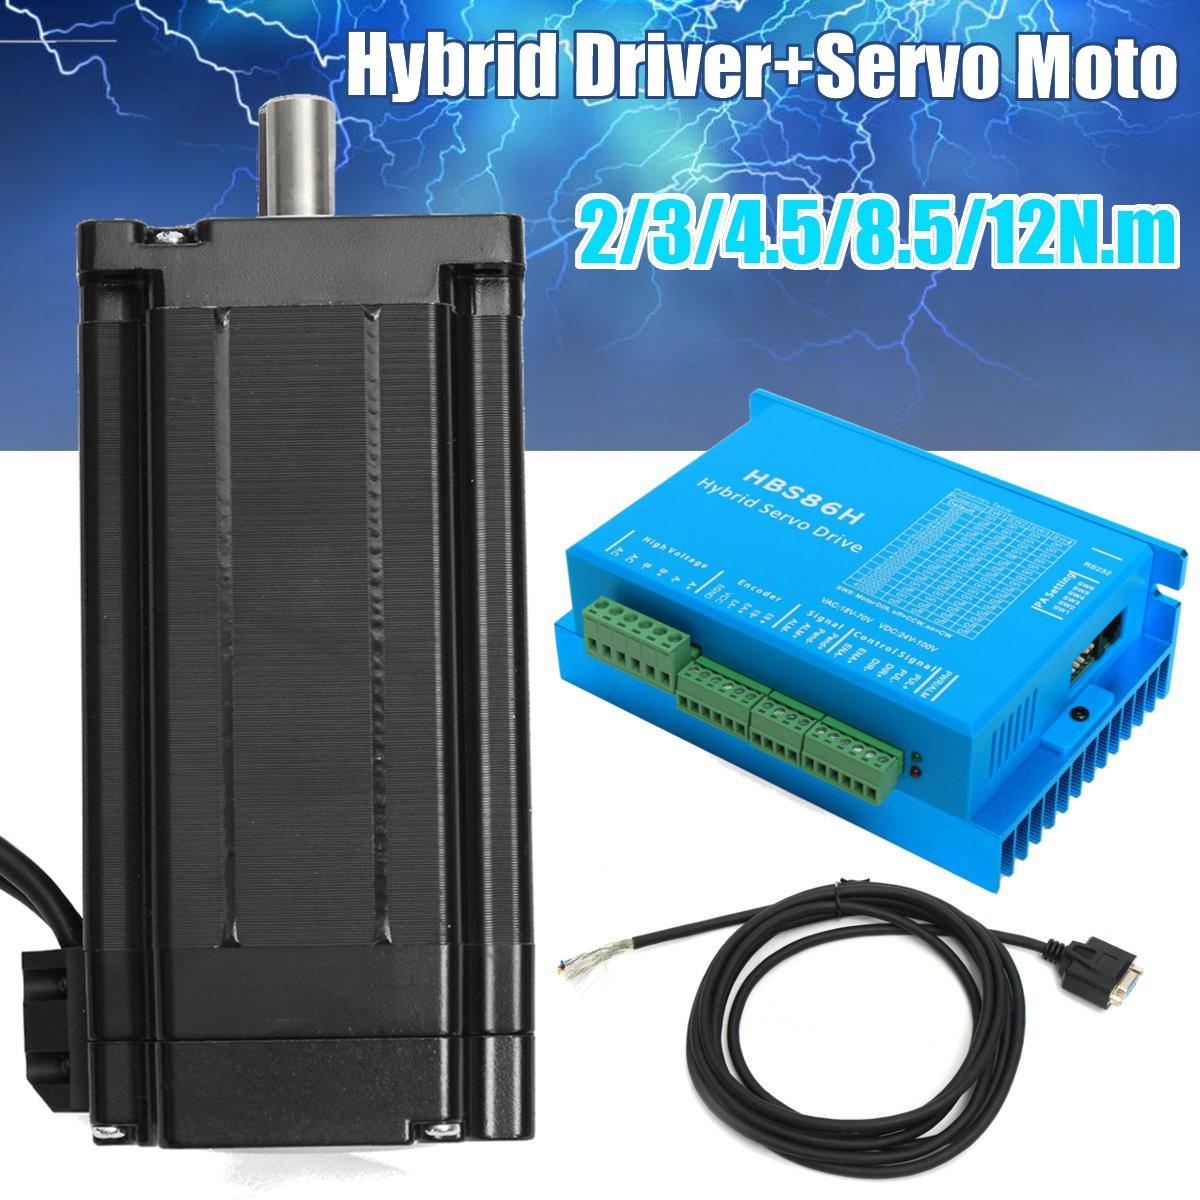 CNC HSS86 Hybrid Fahrer + Servo Motor Nema34 12N. m Closed Loop